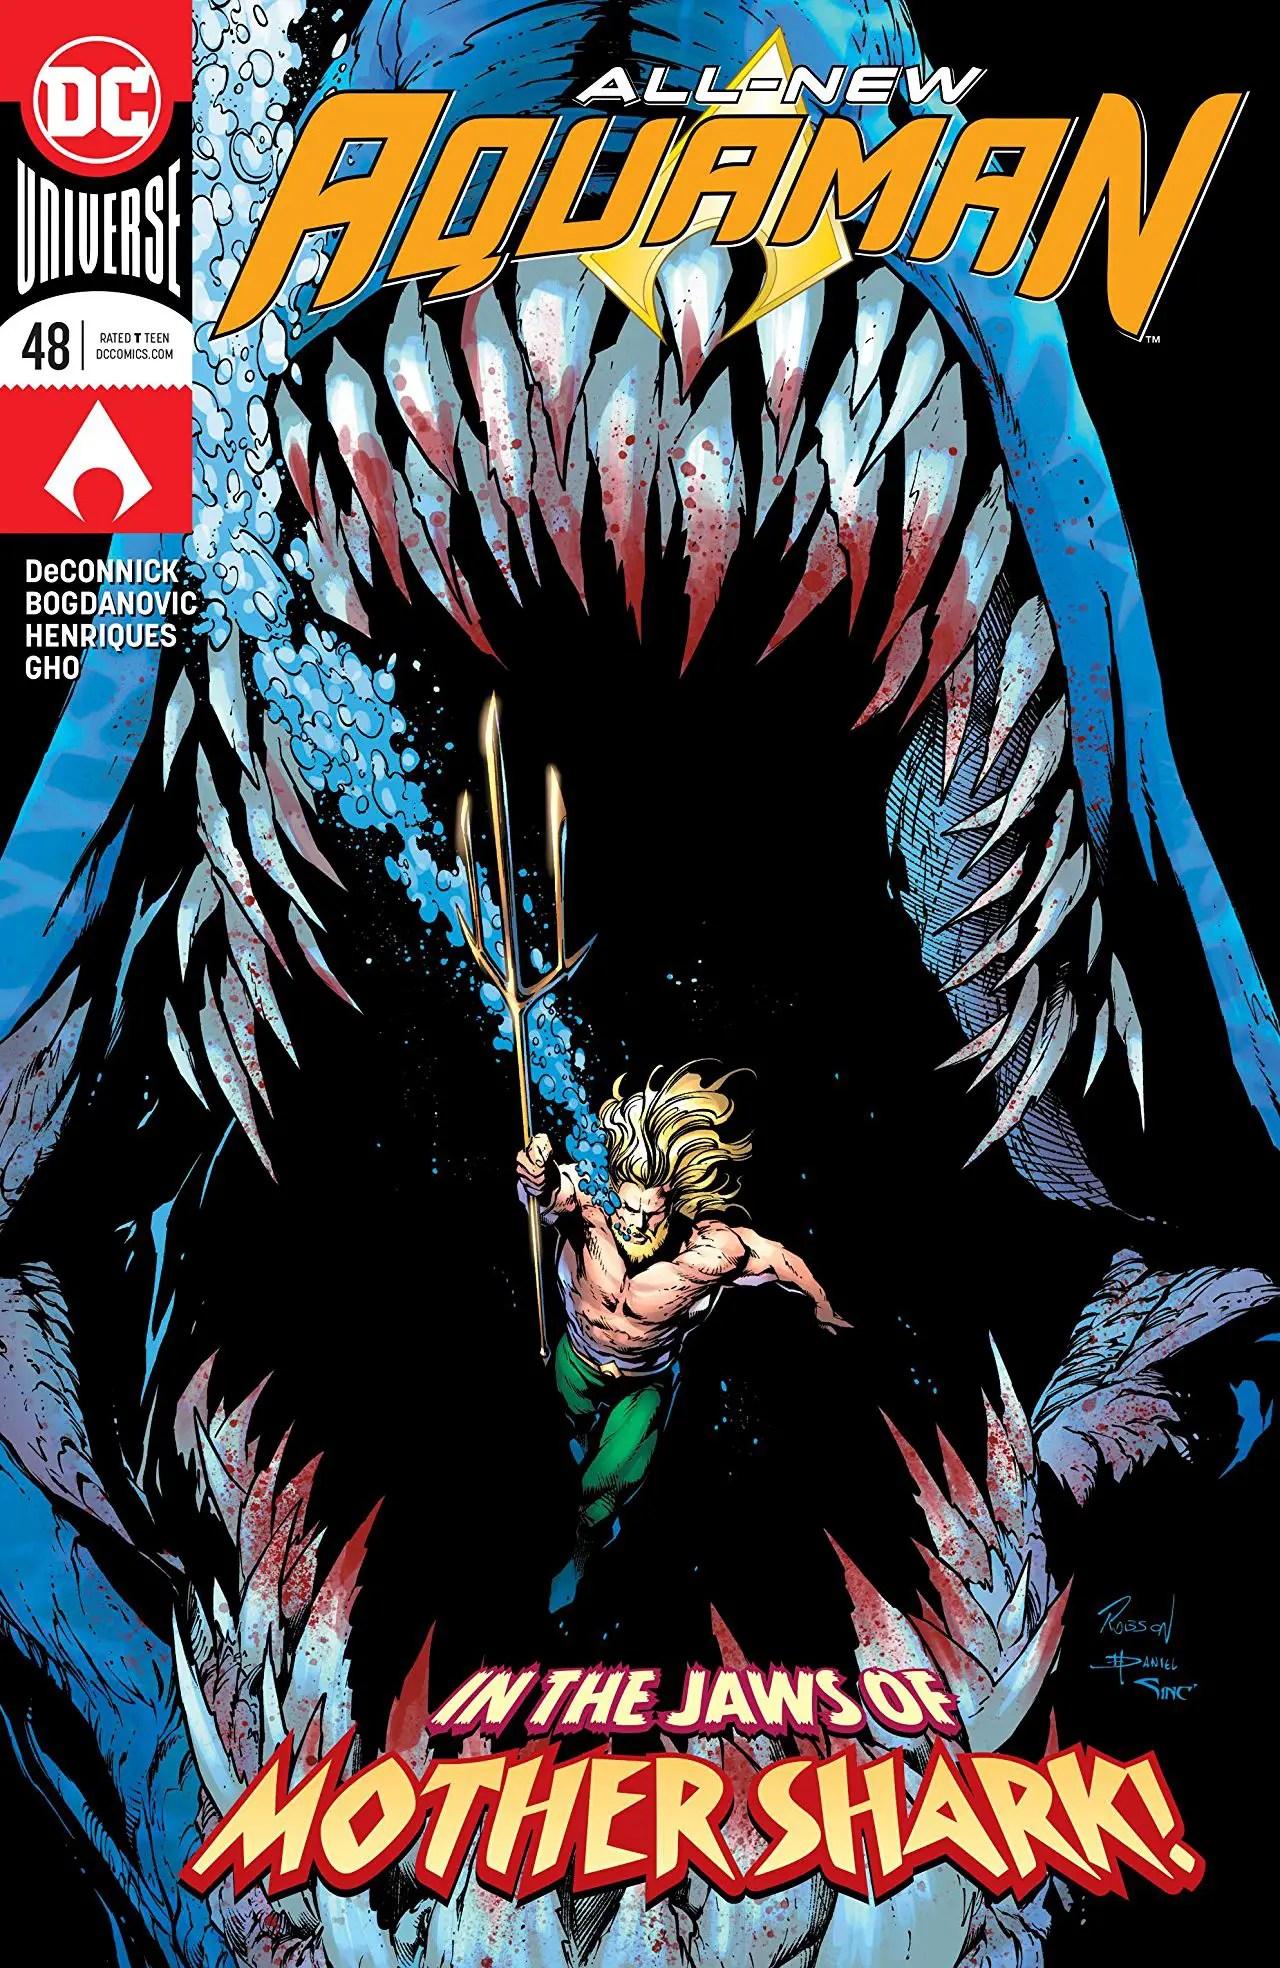 Aquaman #48 review: Mother Shark!